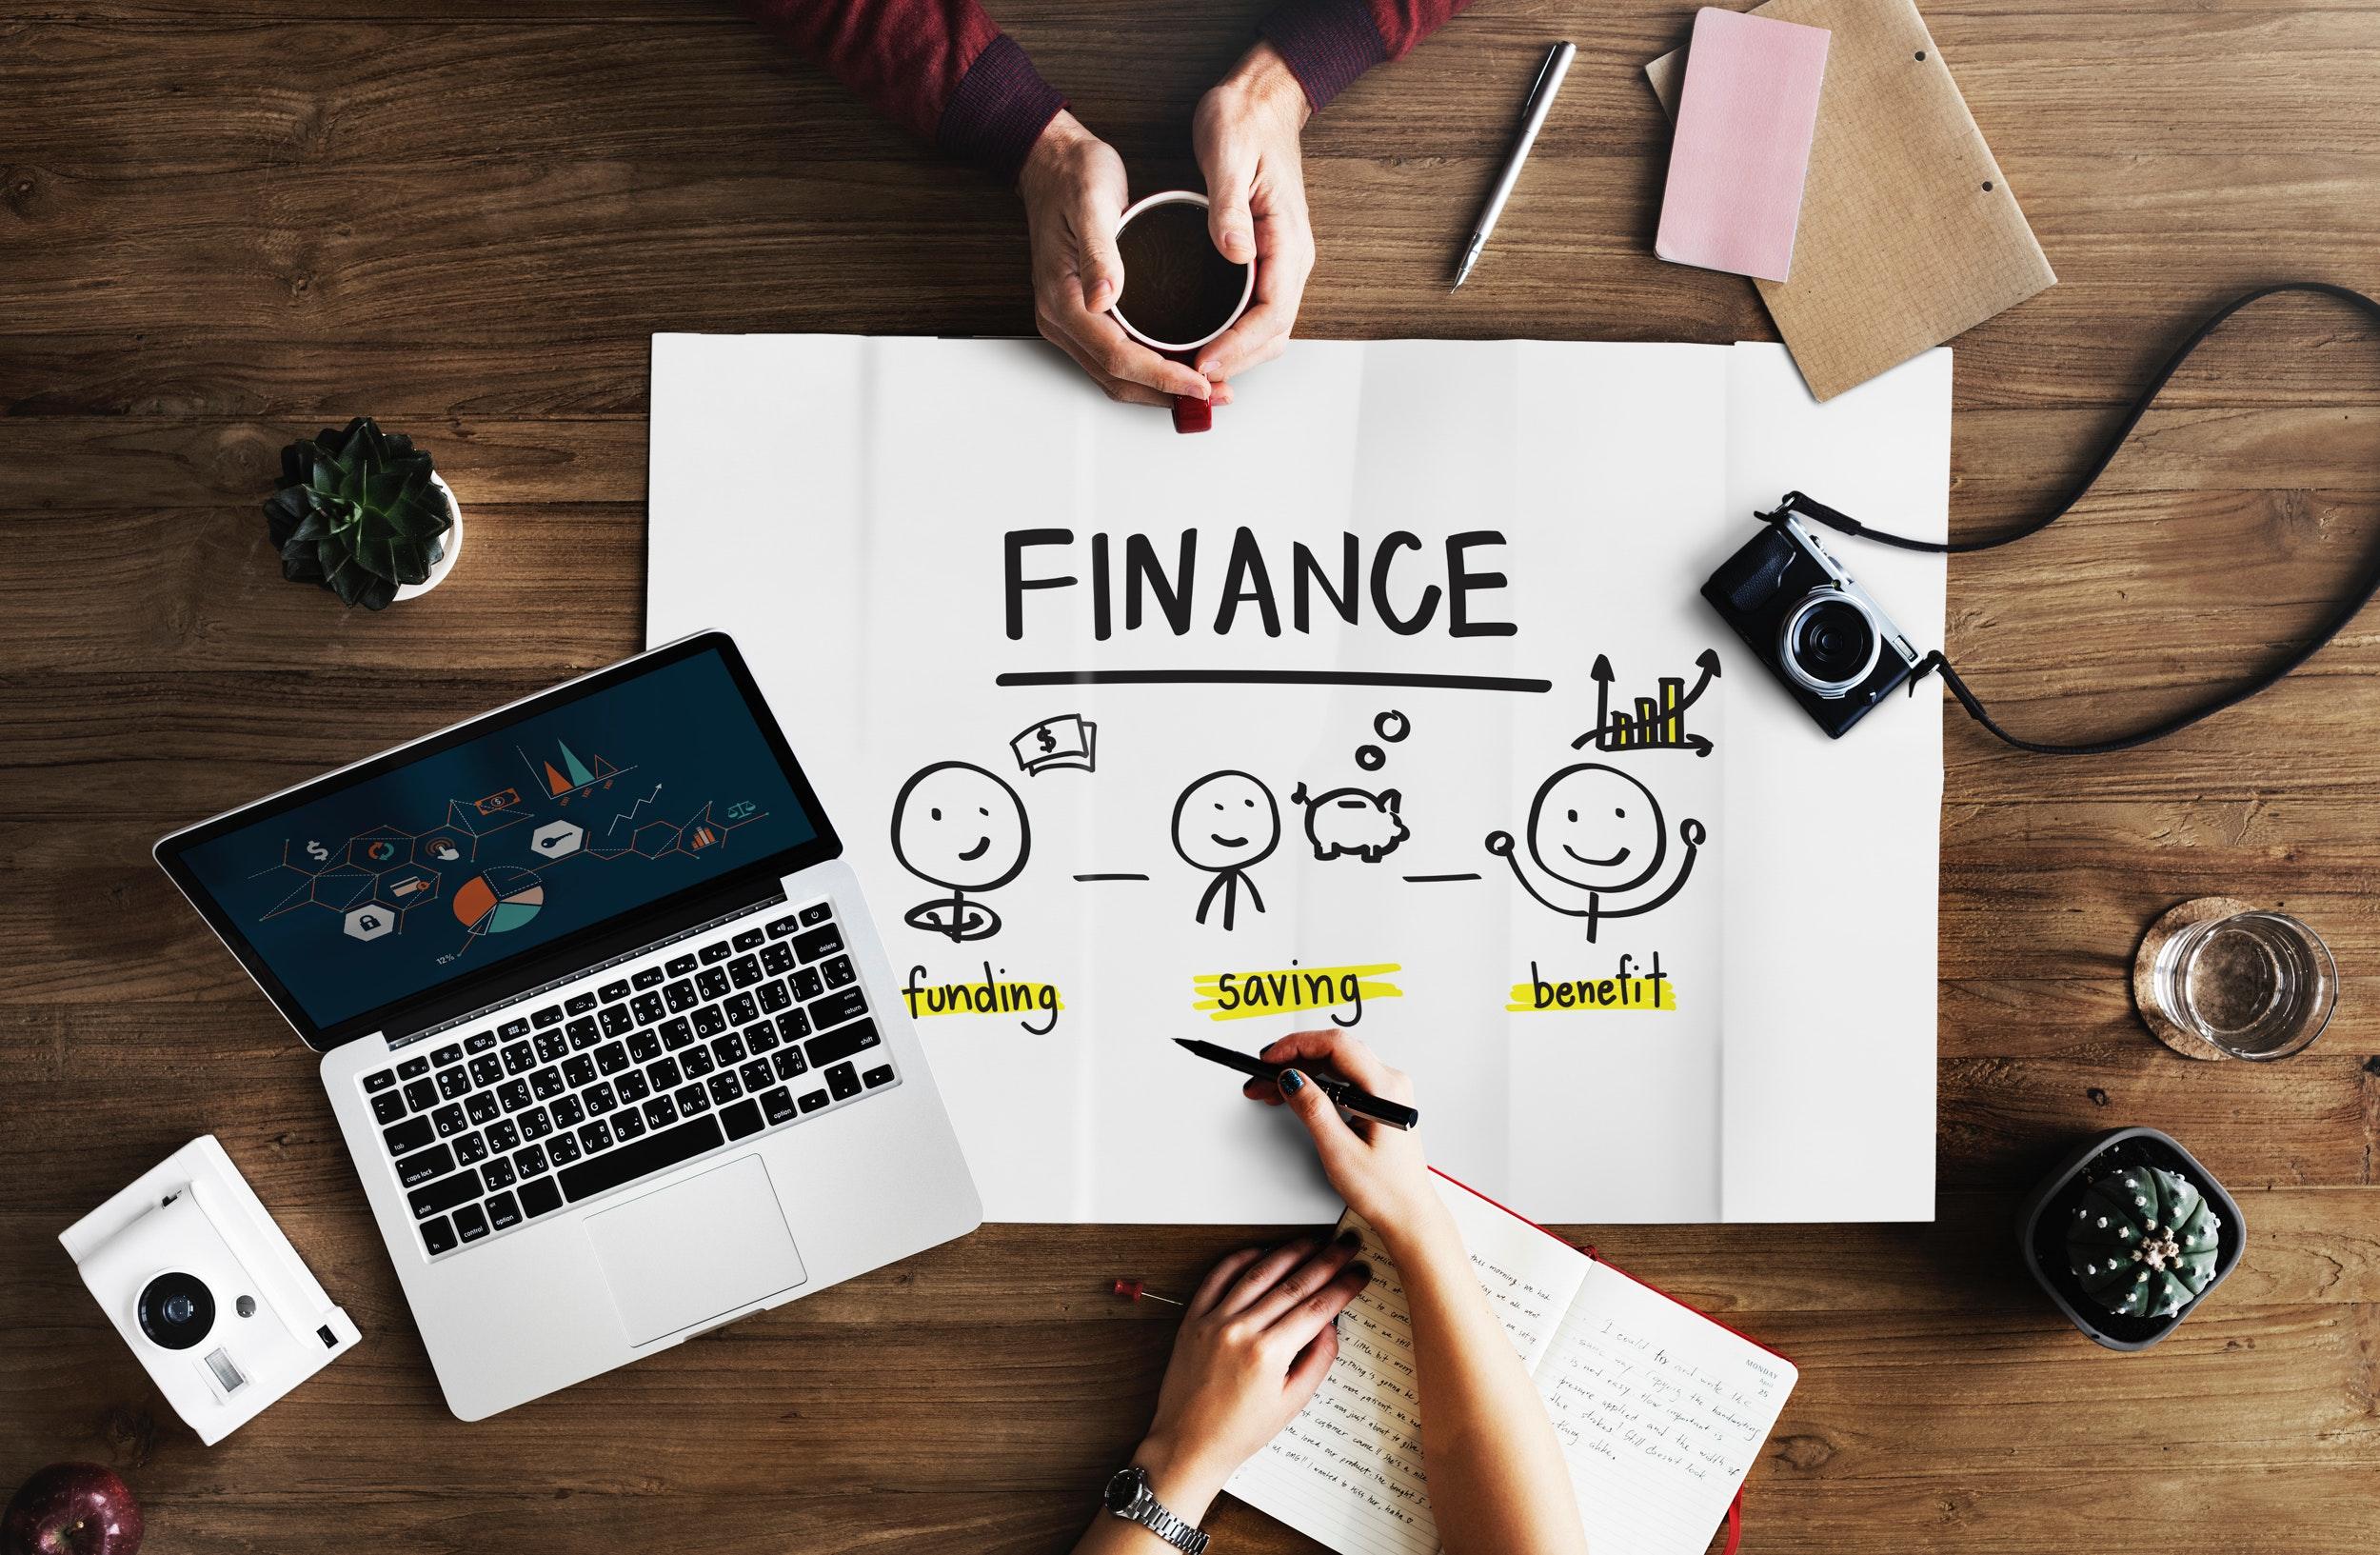 Las Ventajas de Financiar Pleitos